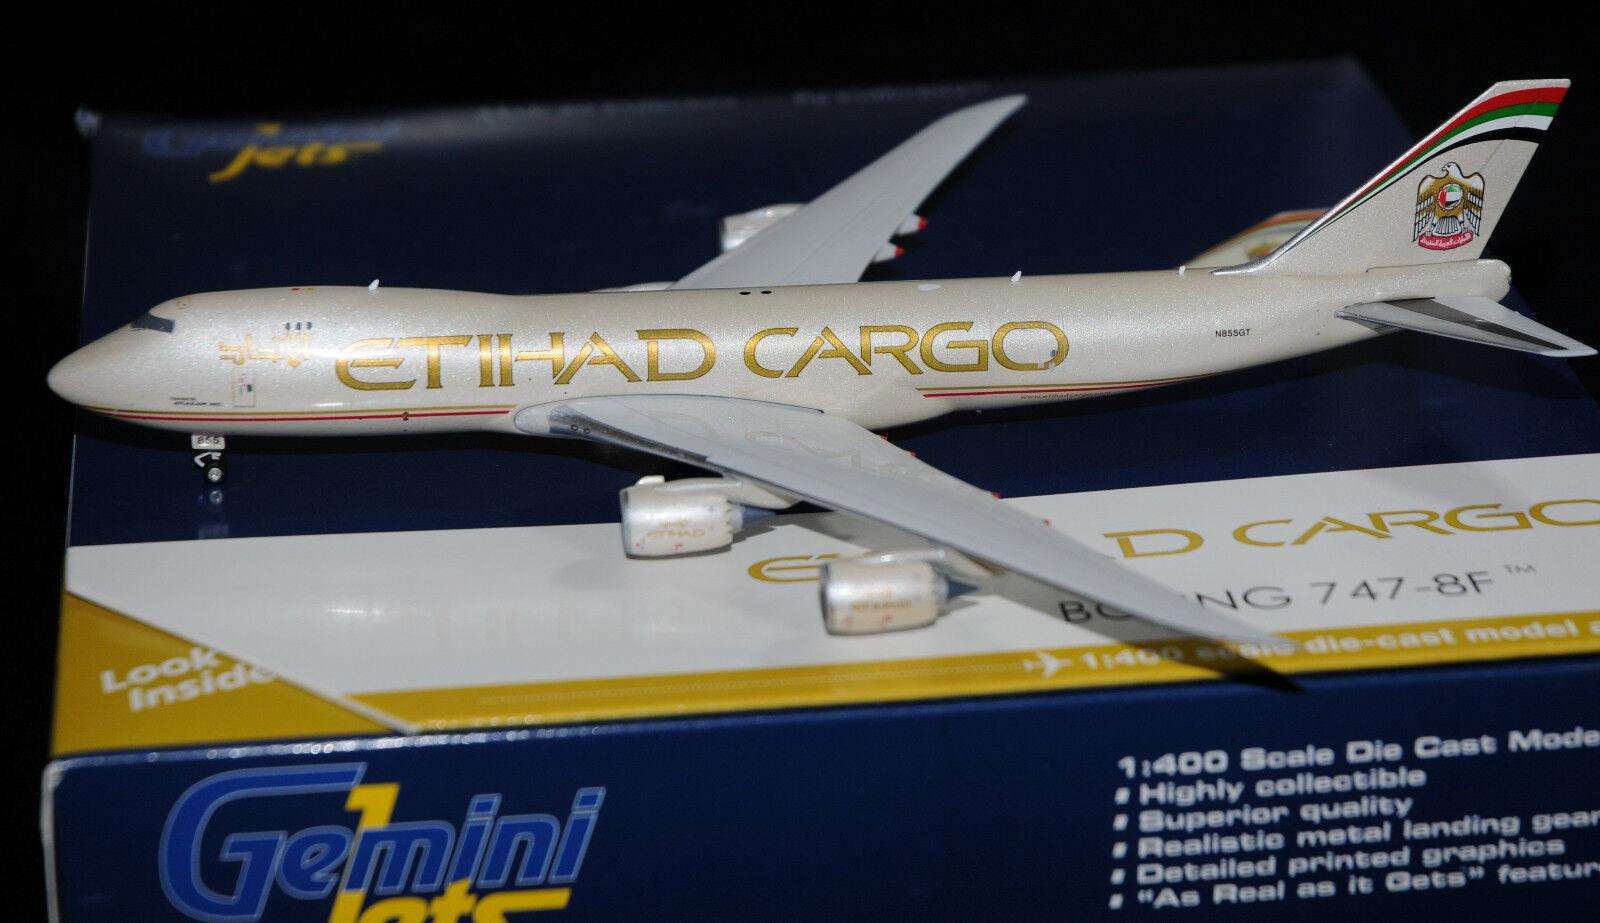 GEMINI JETS 1 400 Boeing B747-8F ETIHAD CARGO N855GT